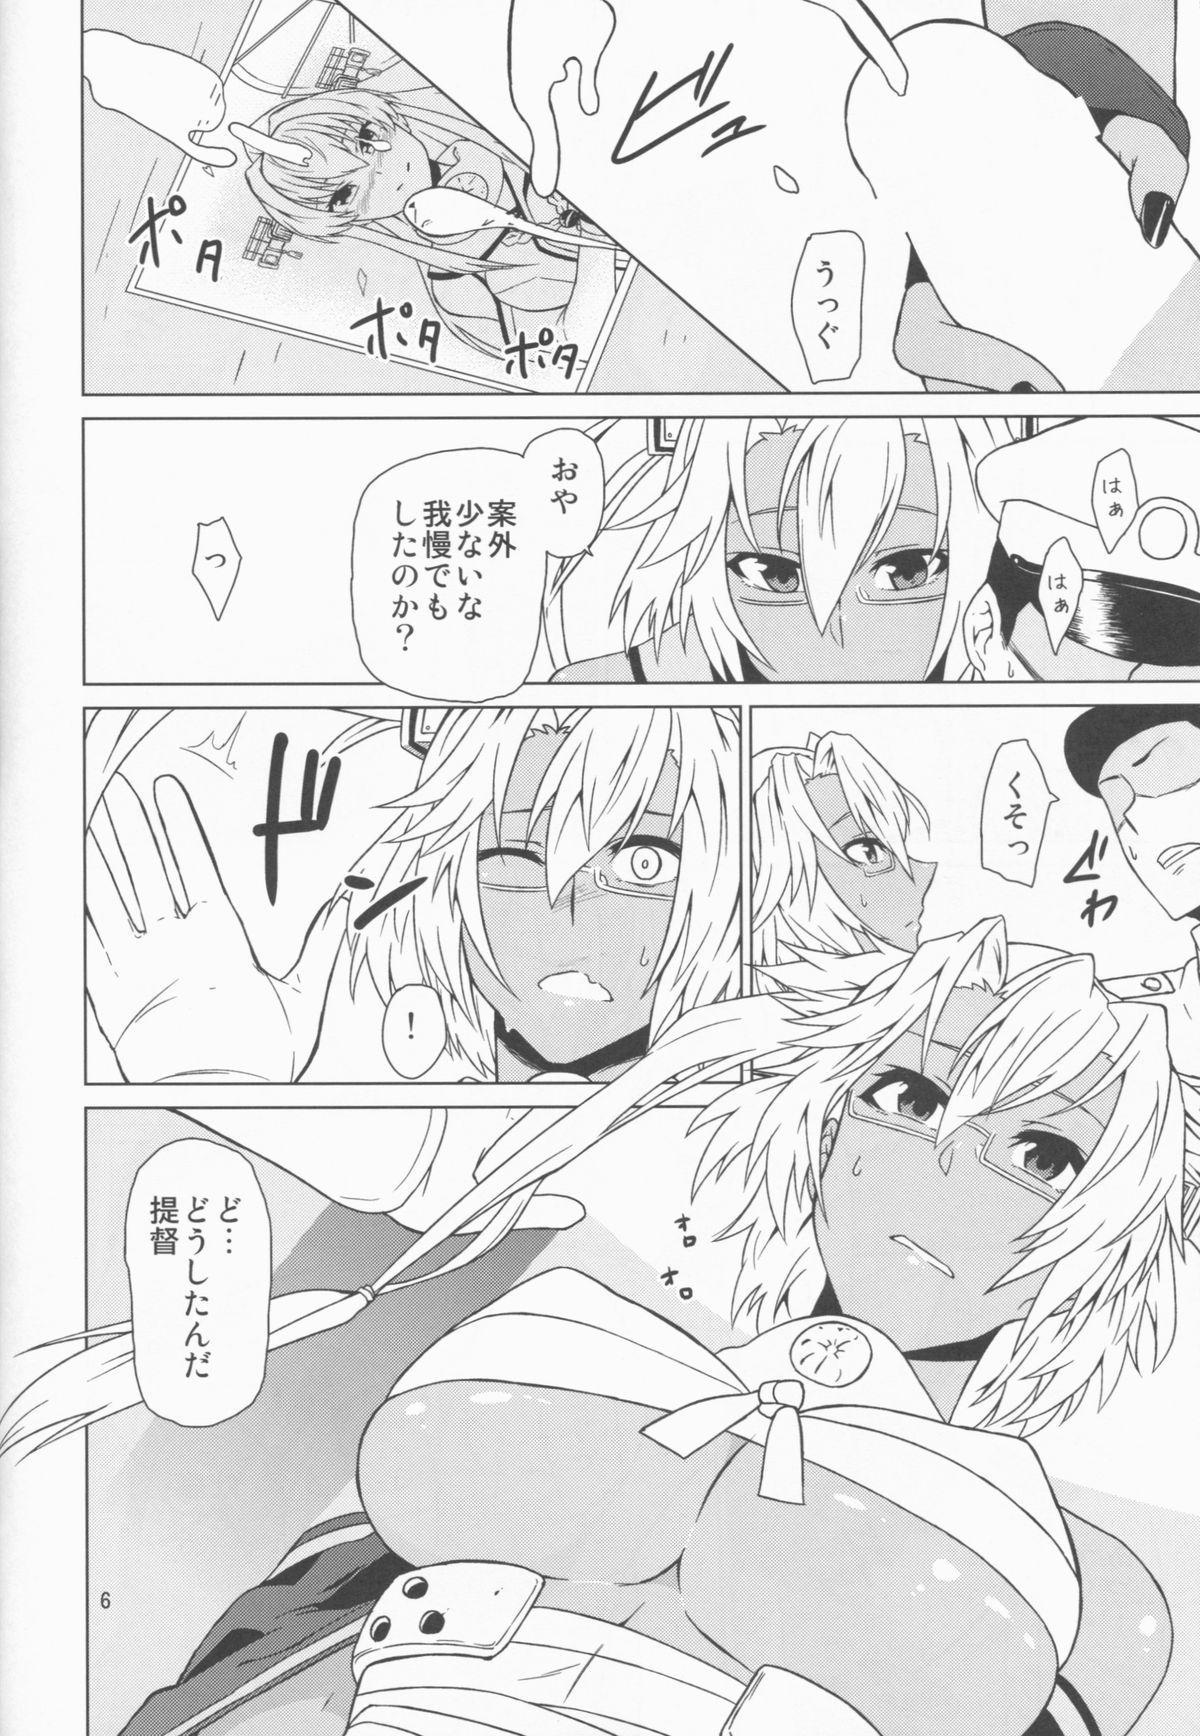 Musashi Route 7